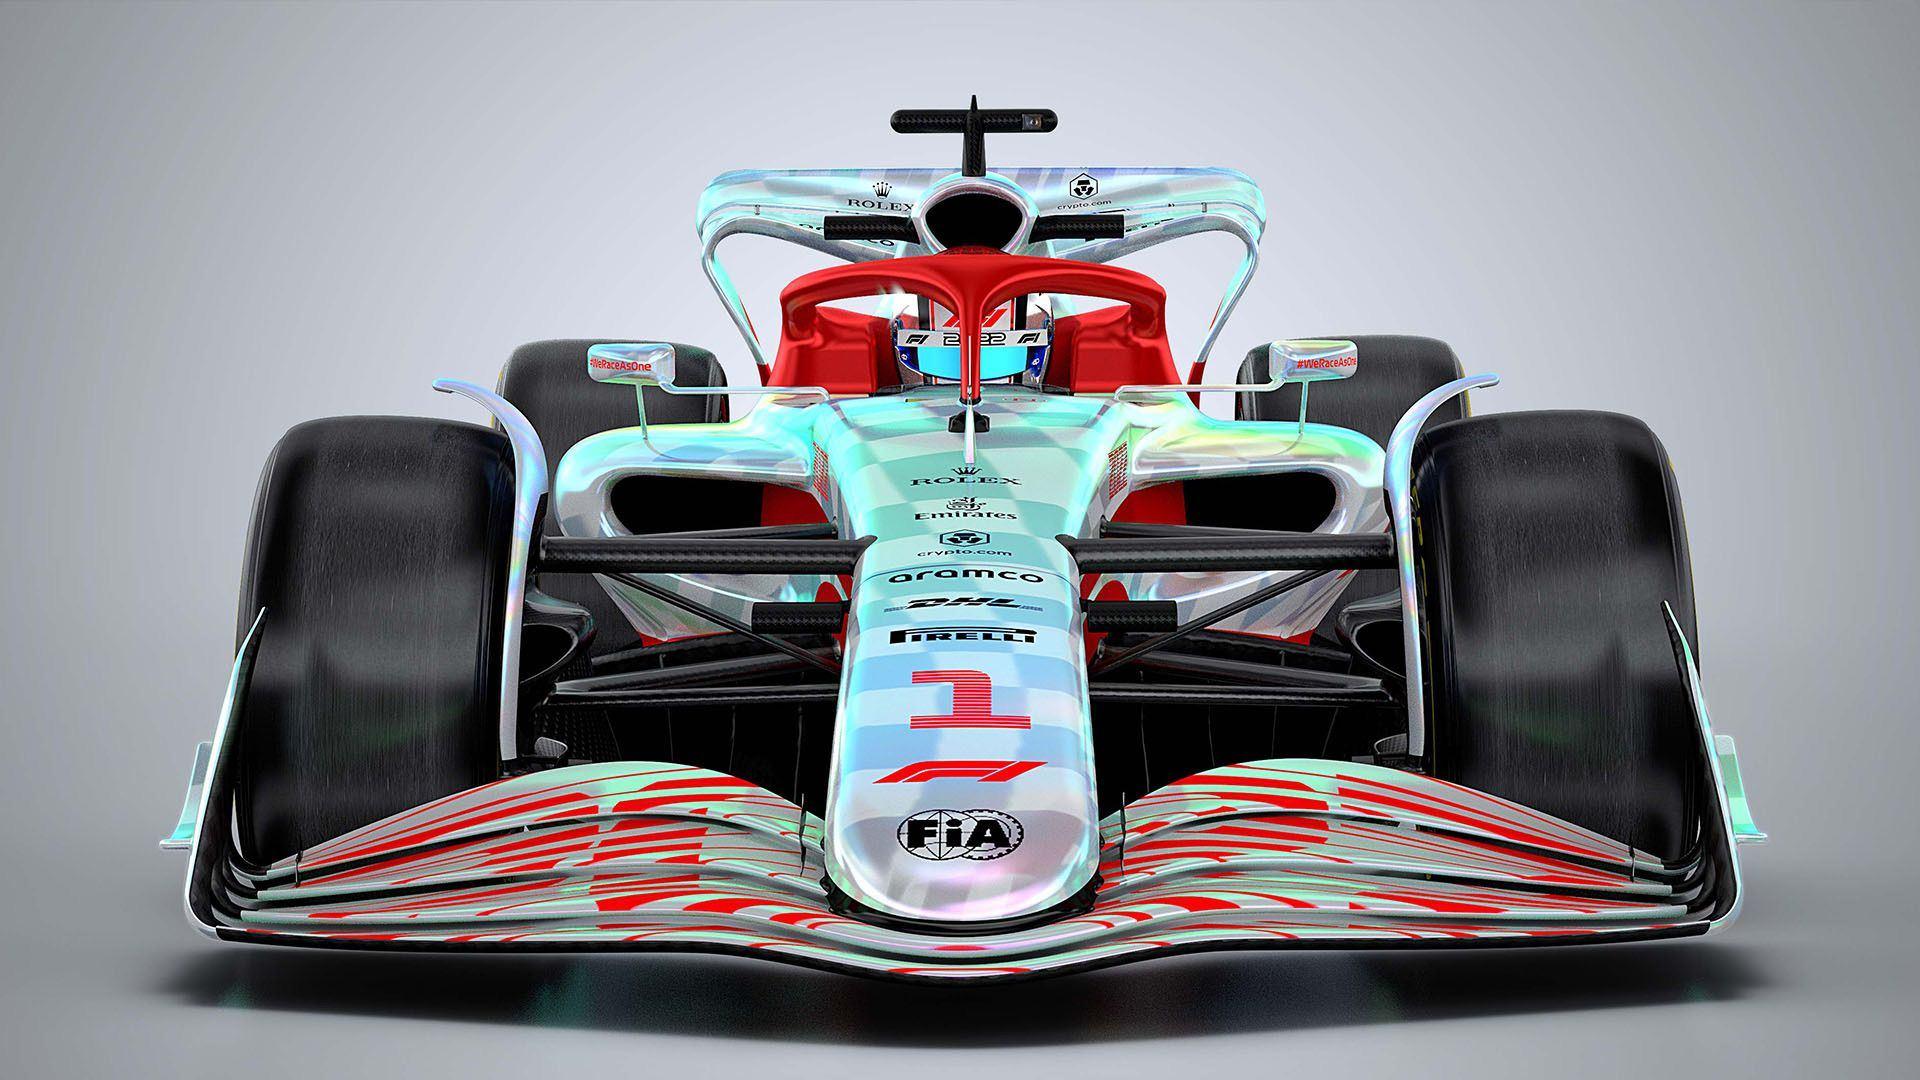 F1-Formula-1-car-2022-11_1920x1080